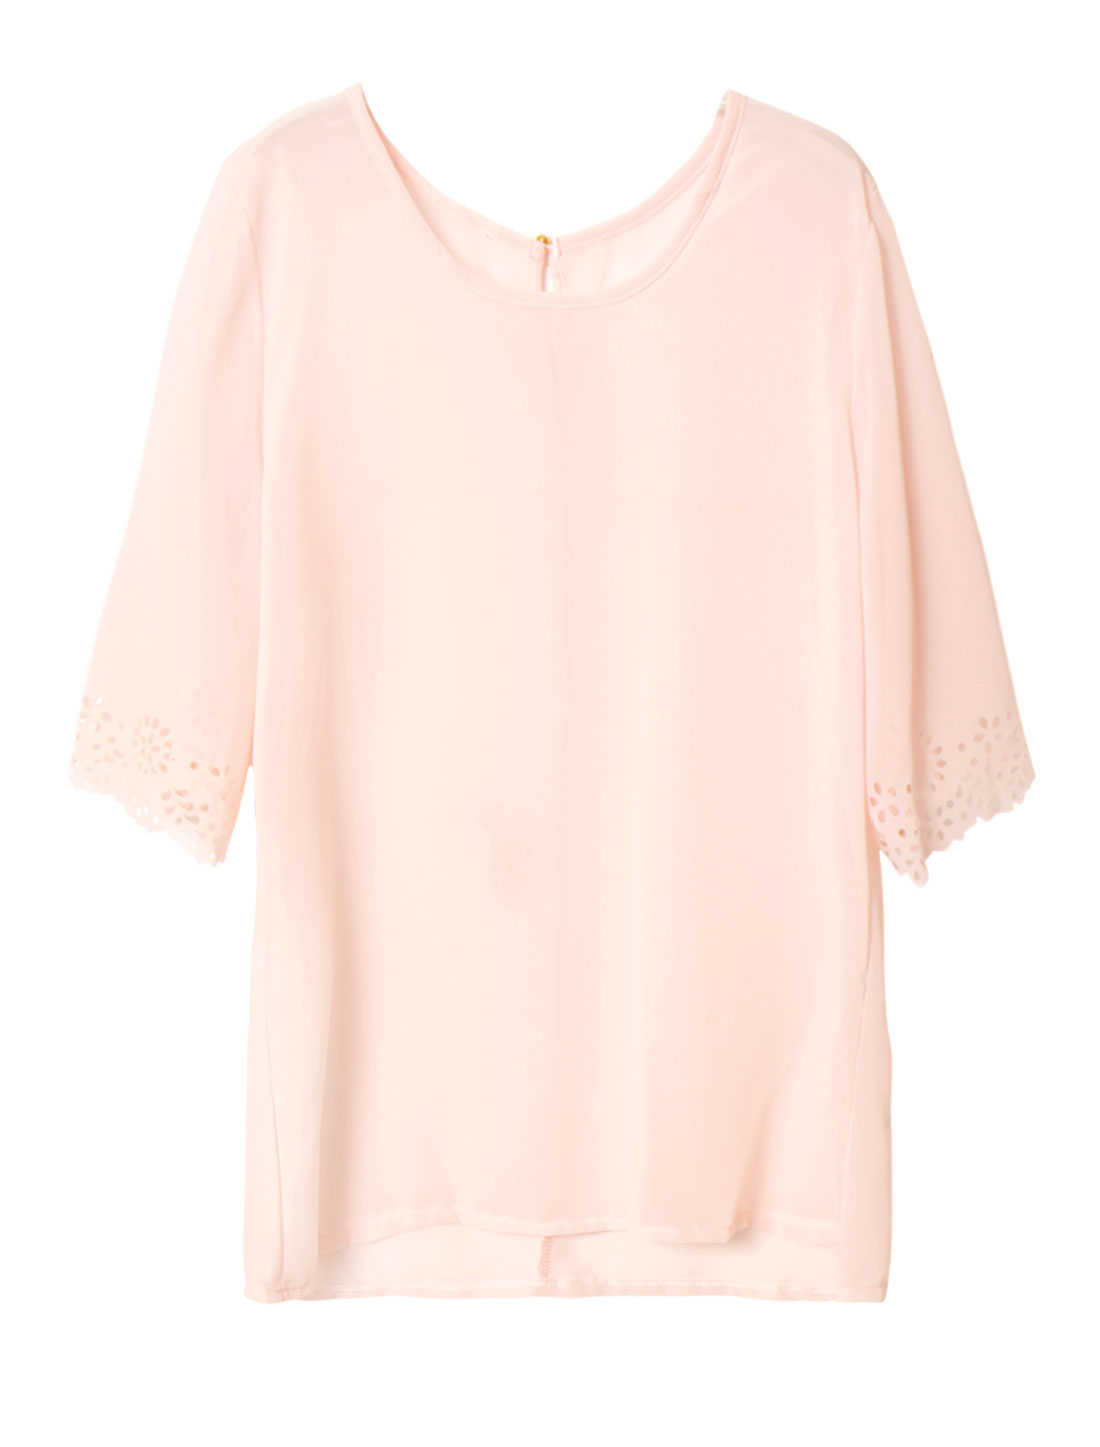 Women Embossed Half Sleeves Semi Sheer Chiffon Blouse Pink S